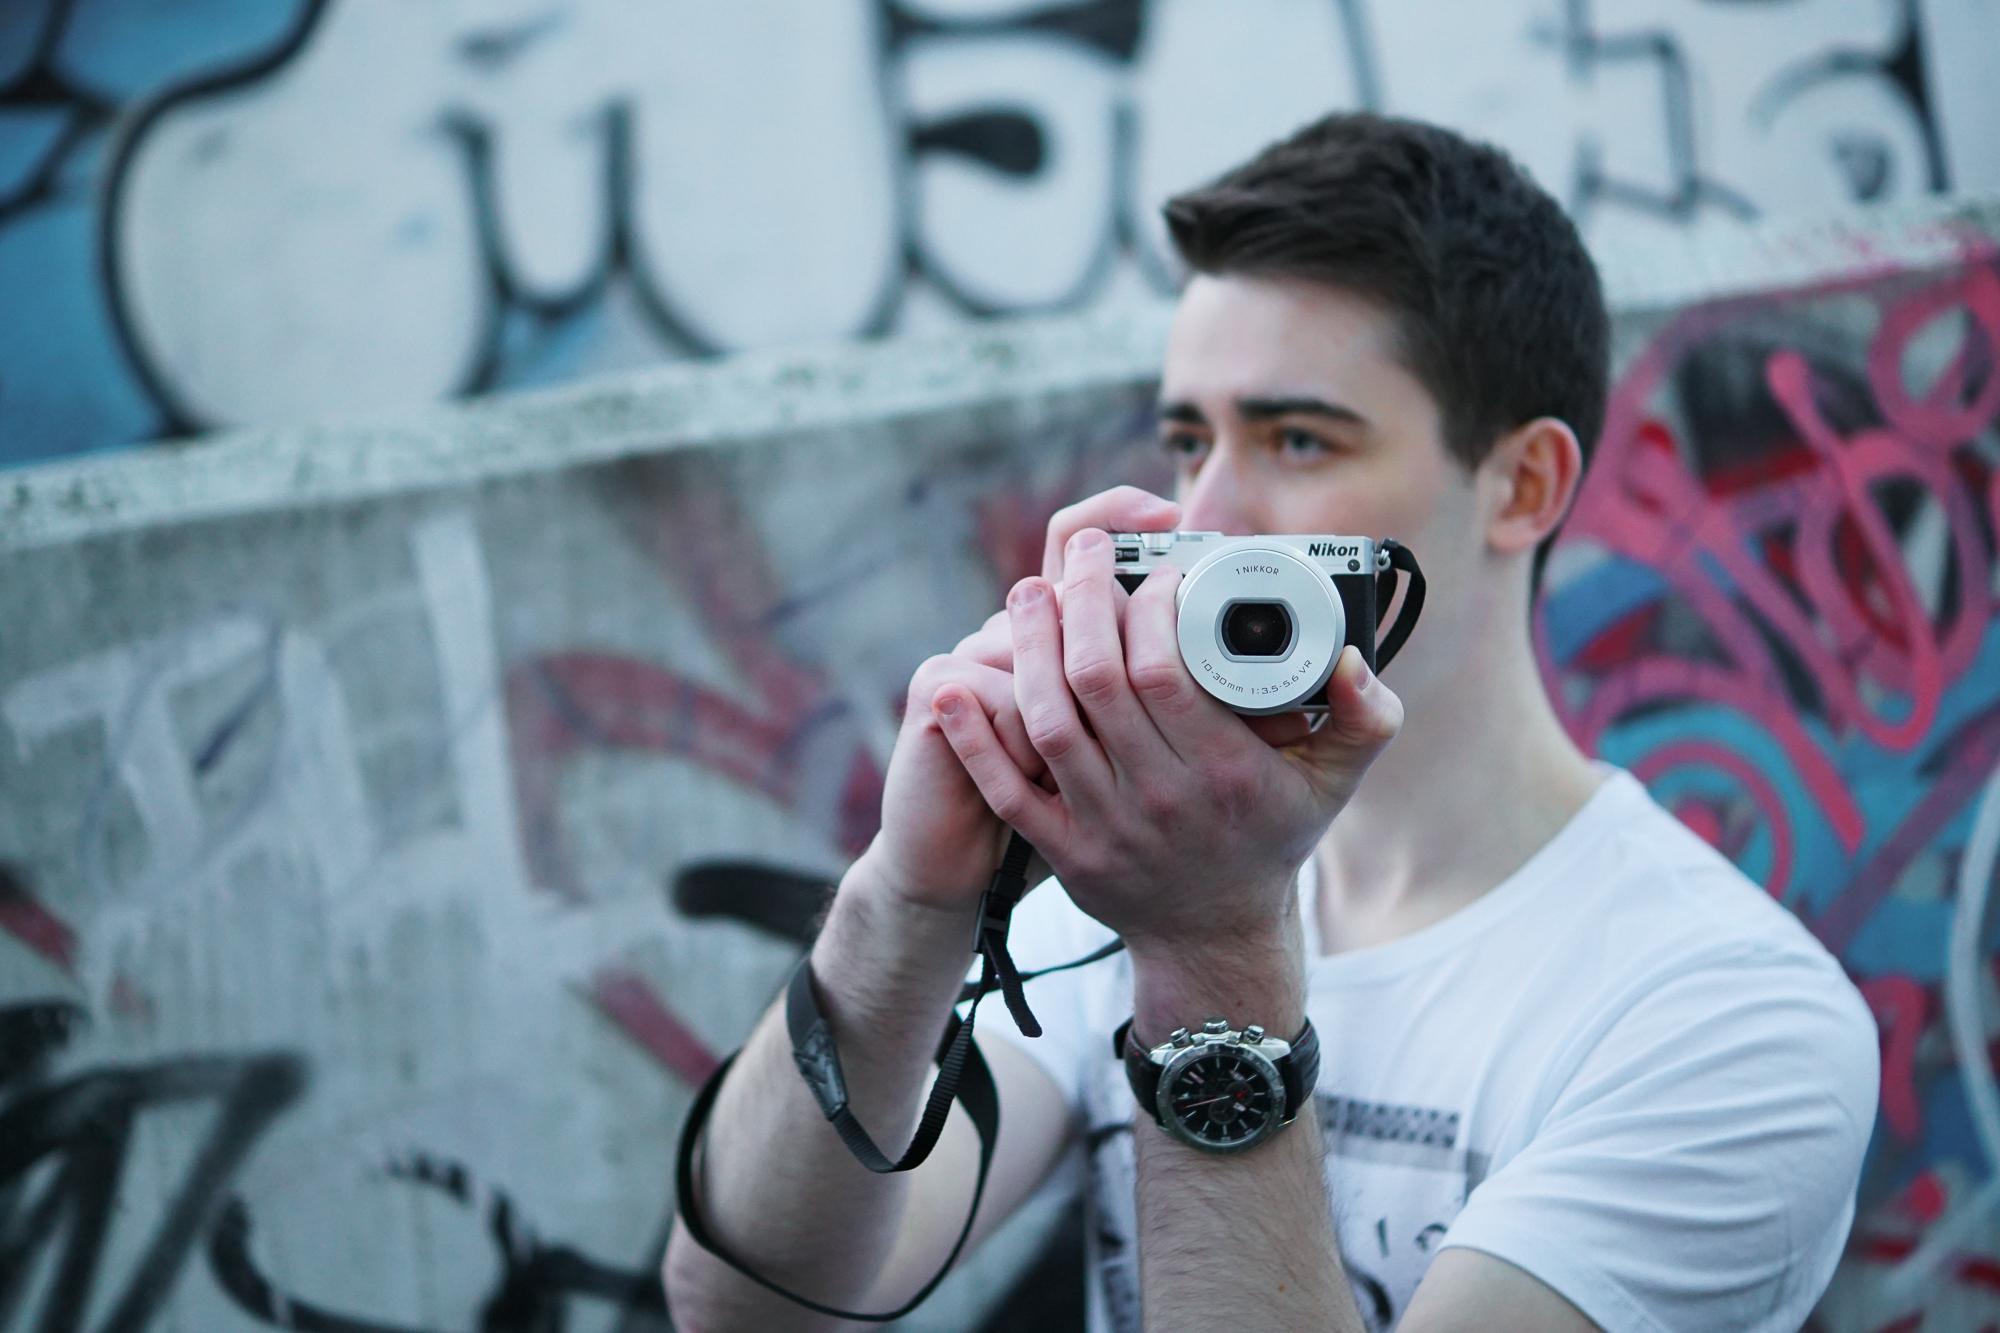 Petr-Vocelka-Nikon-1-J5-8